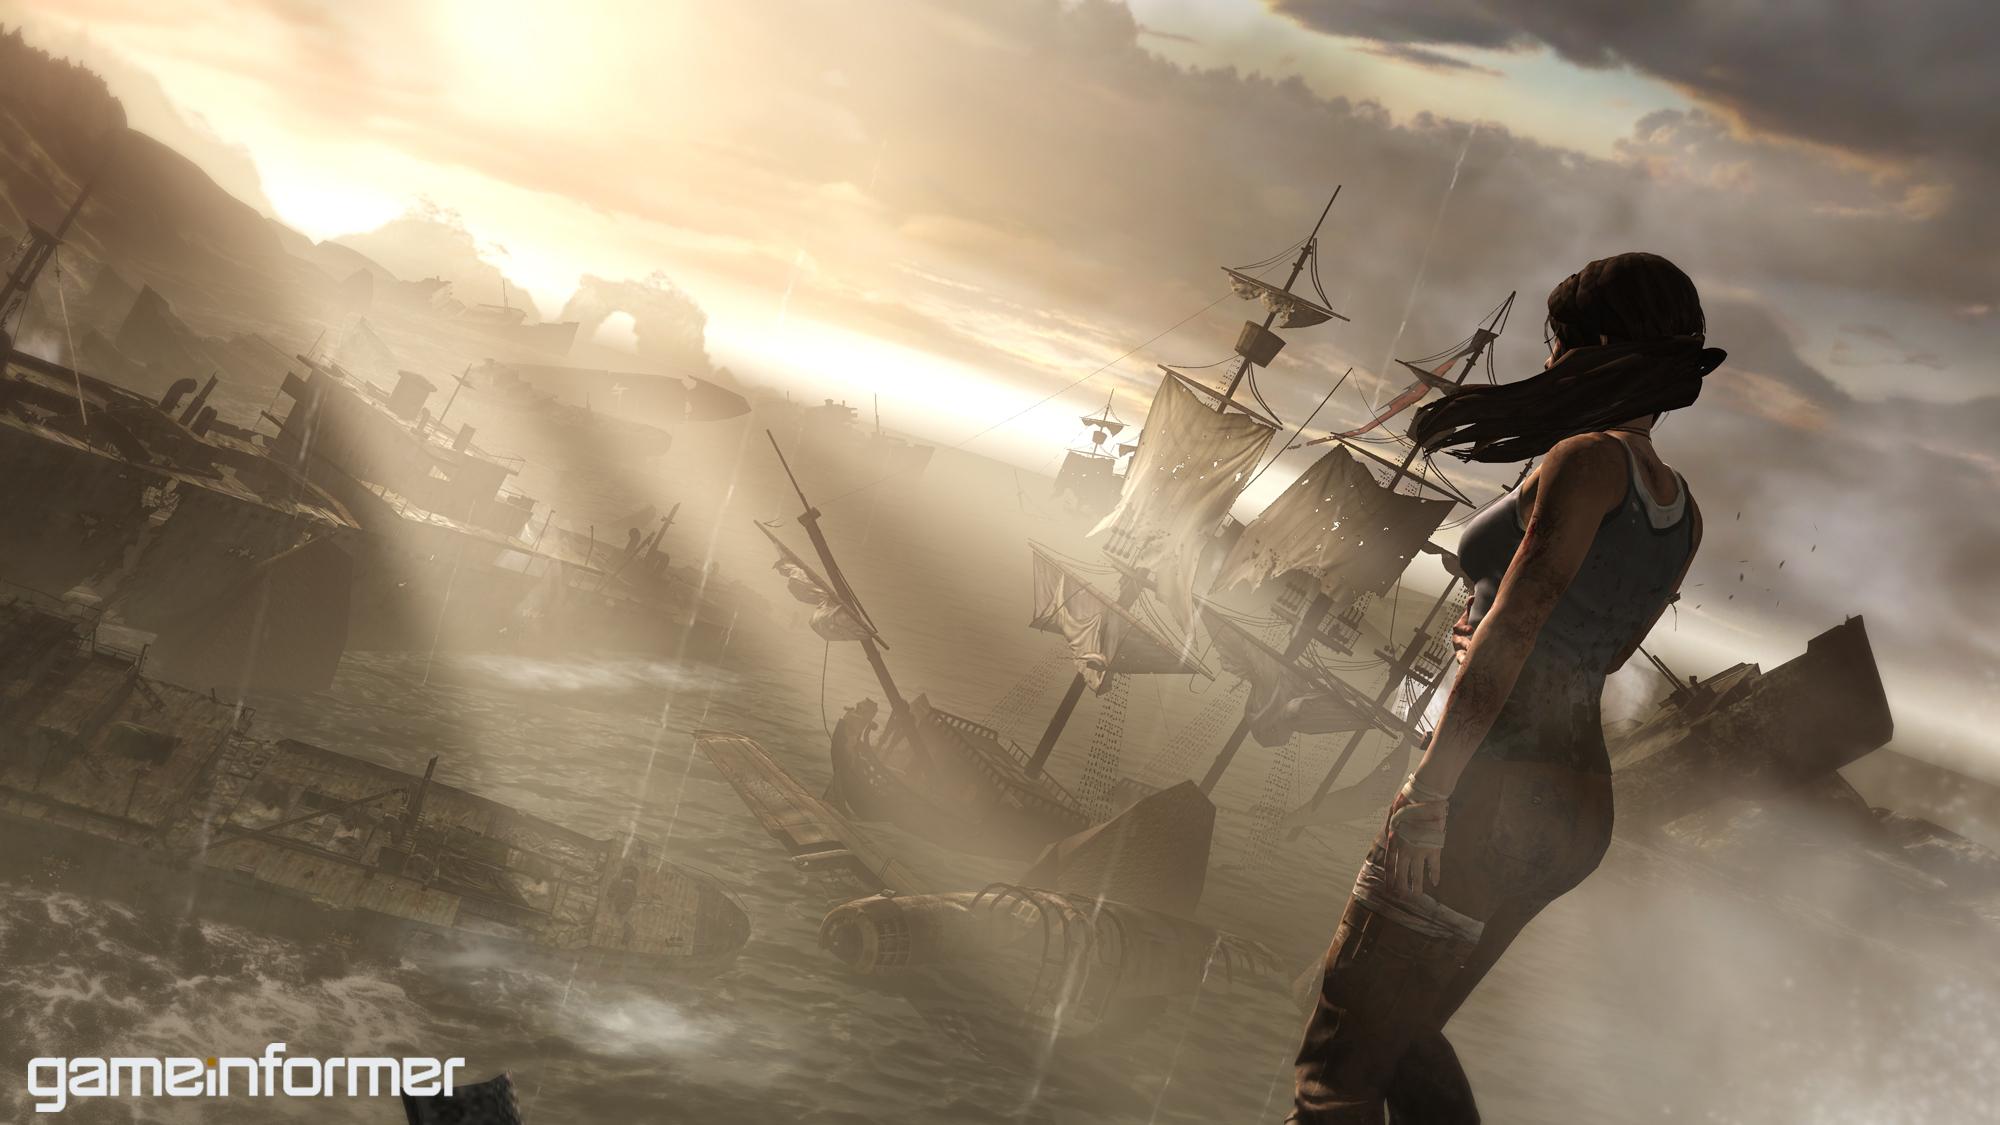 Game Informer releases Tomb Raider screens/art